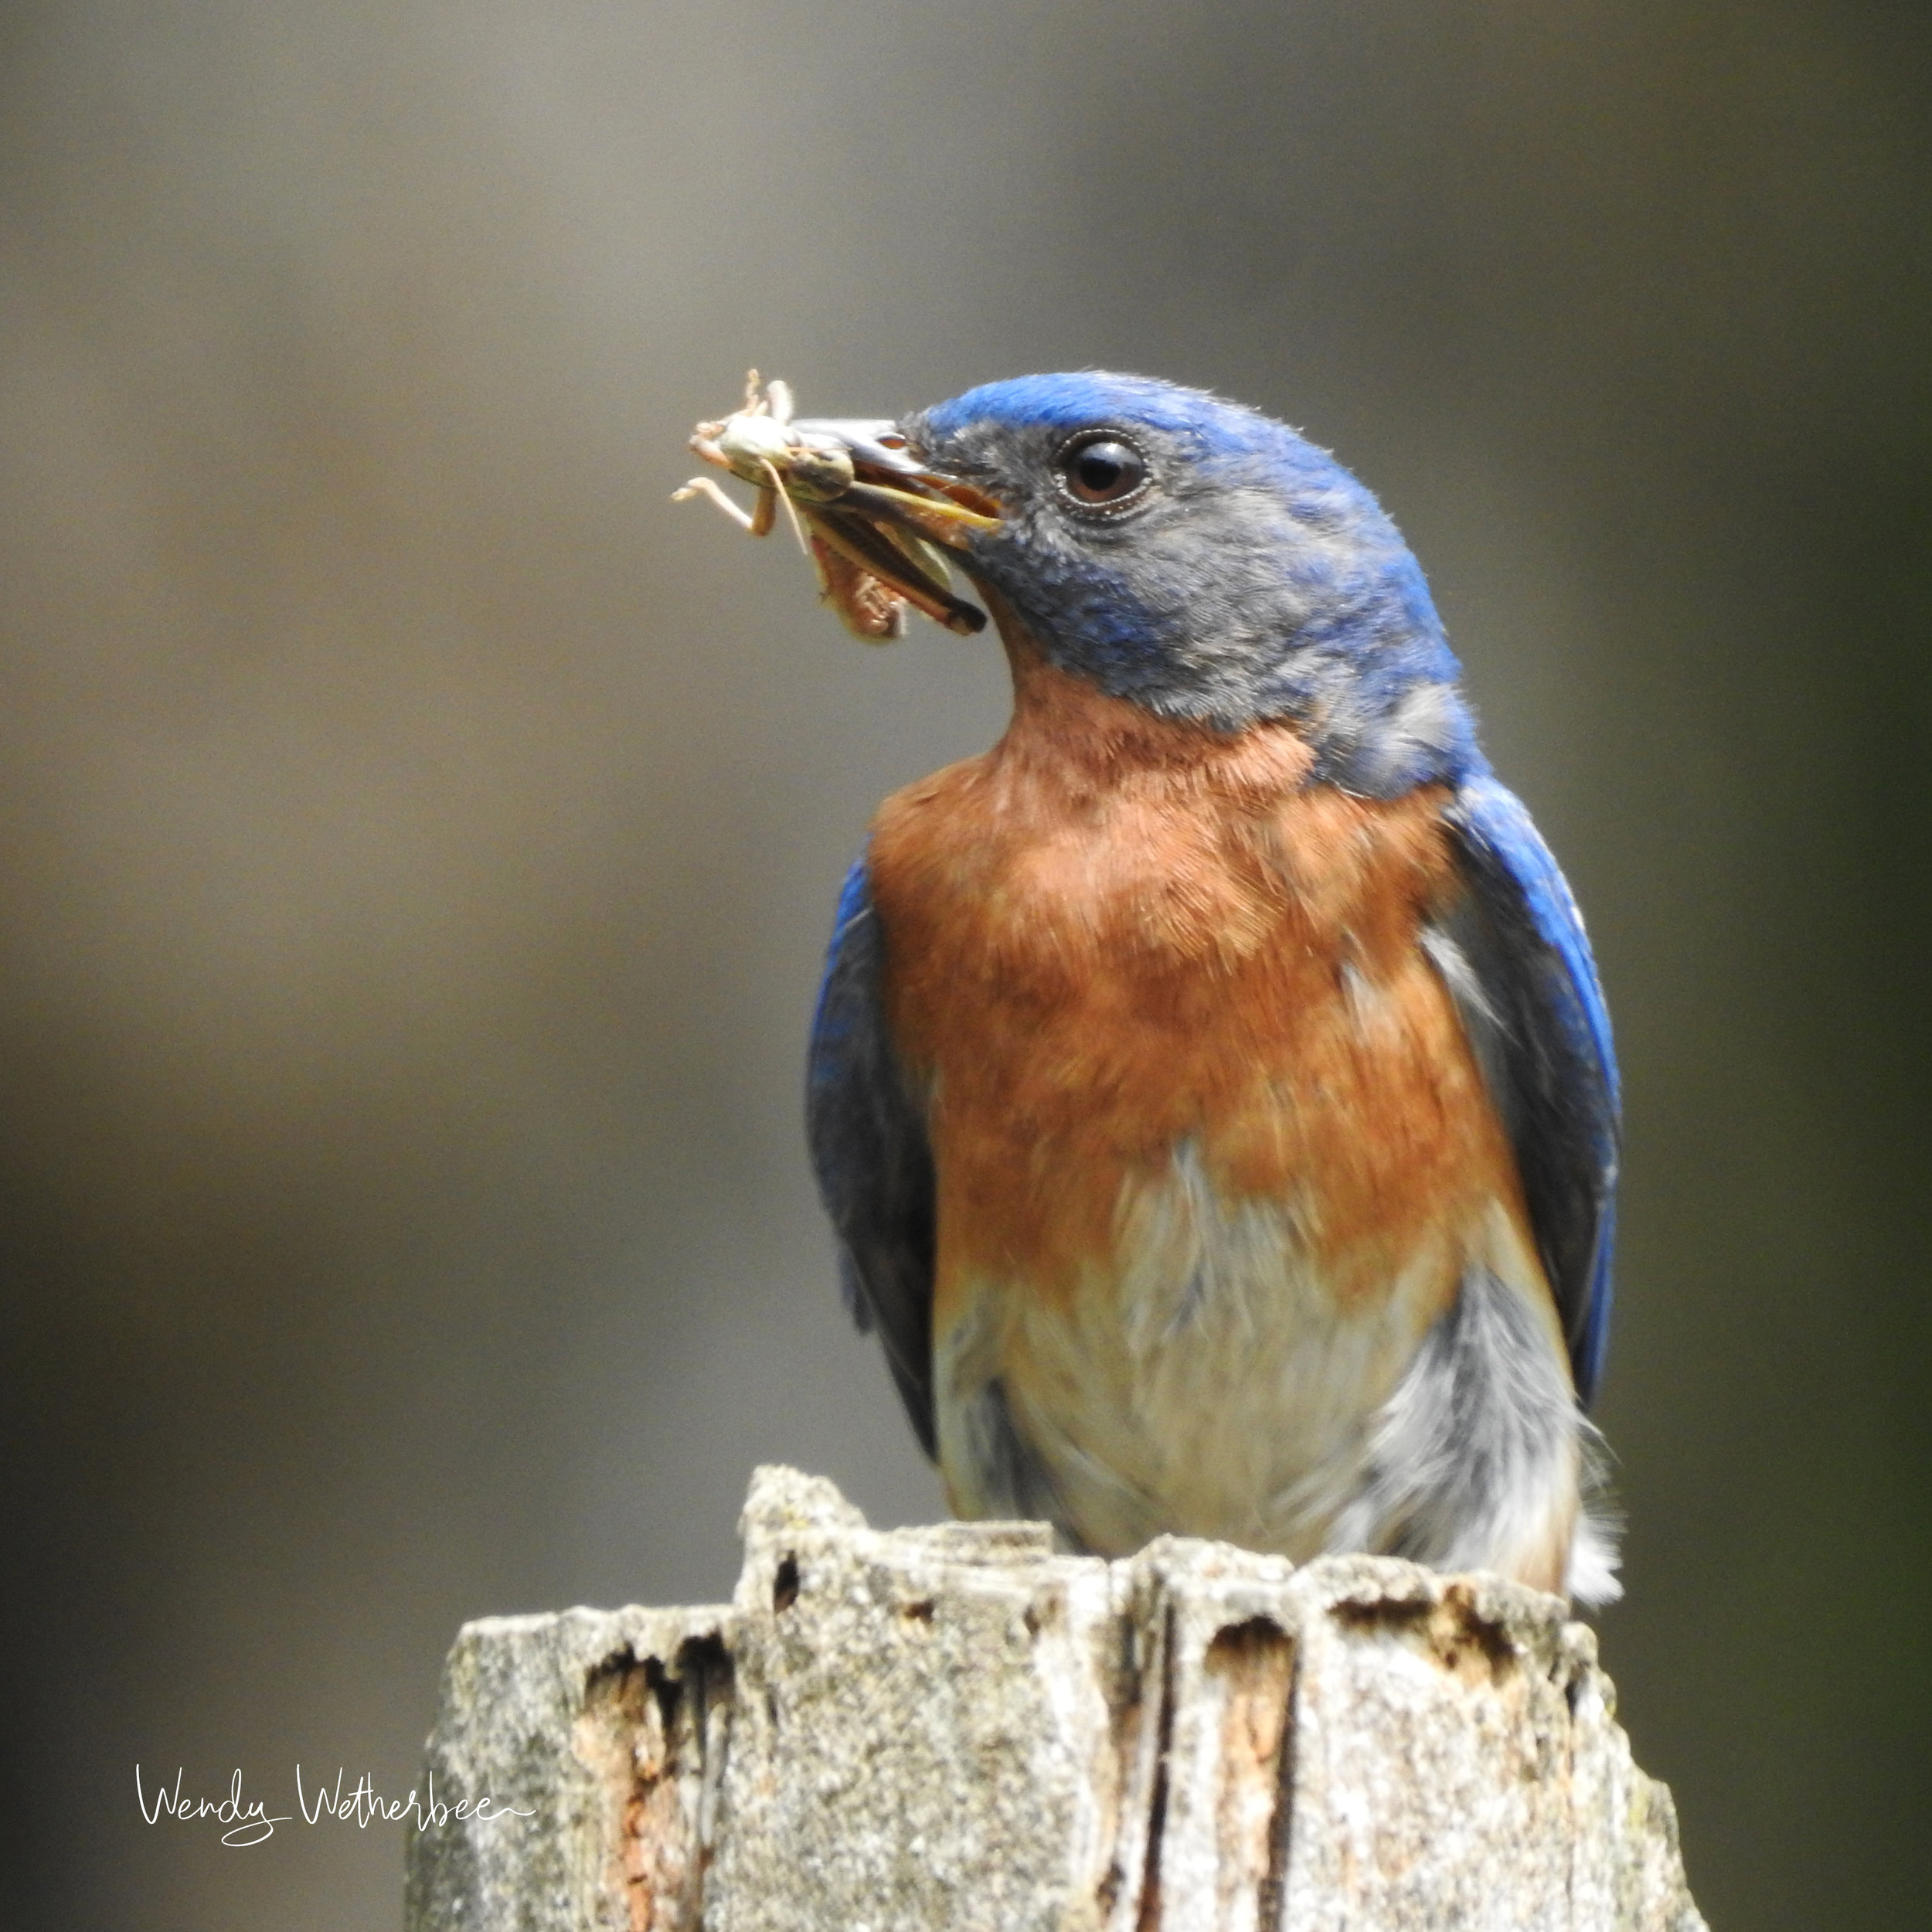 Bluebird with Breakfast for Babies © Wendy Wetherbee